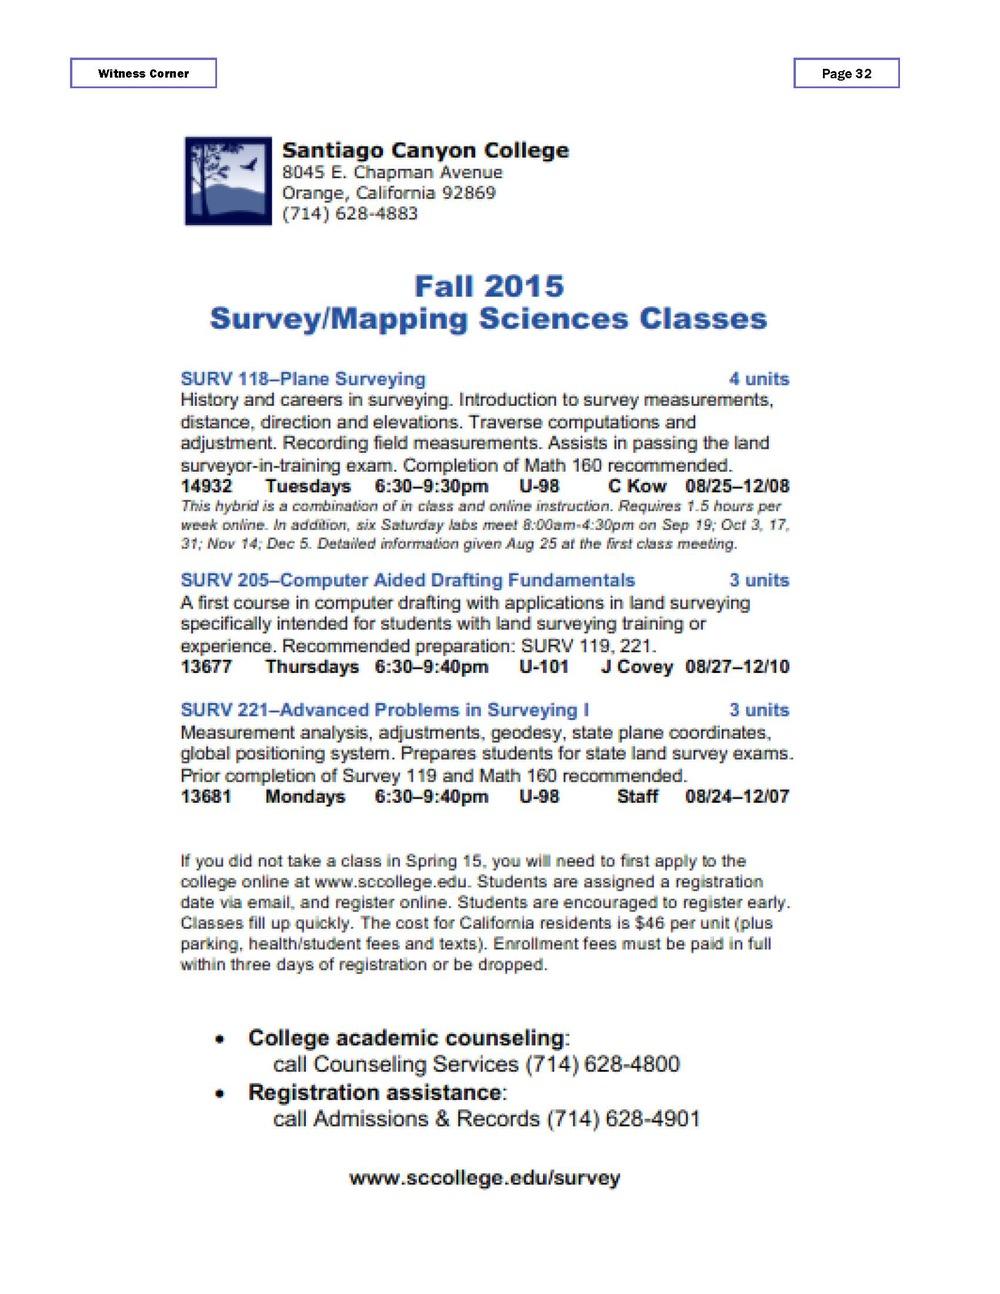 OC-CLSA 082015 Newsletter_Page_38.jpg